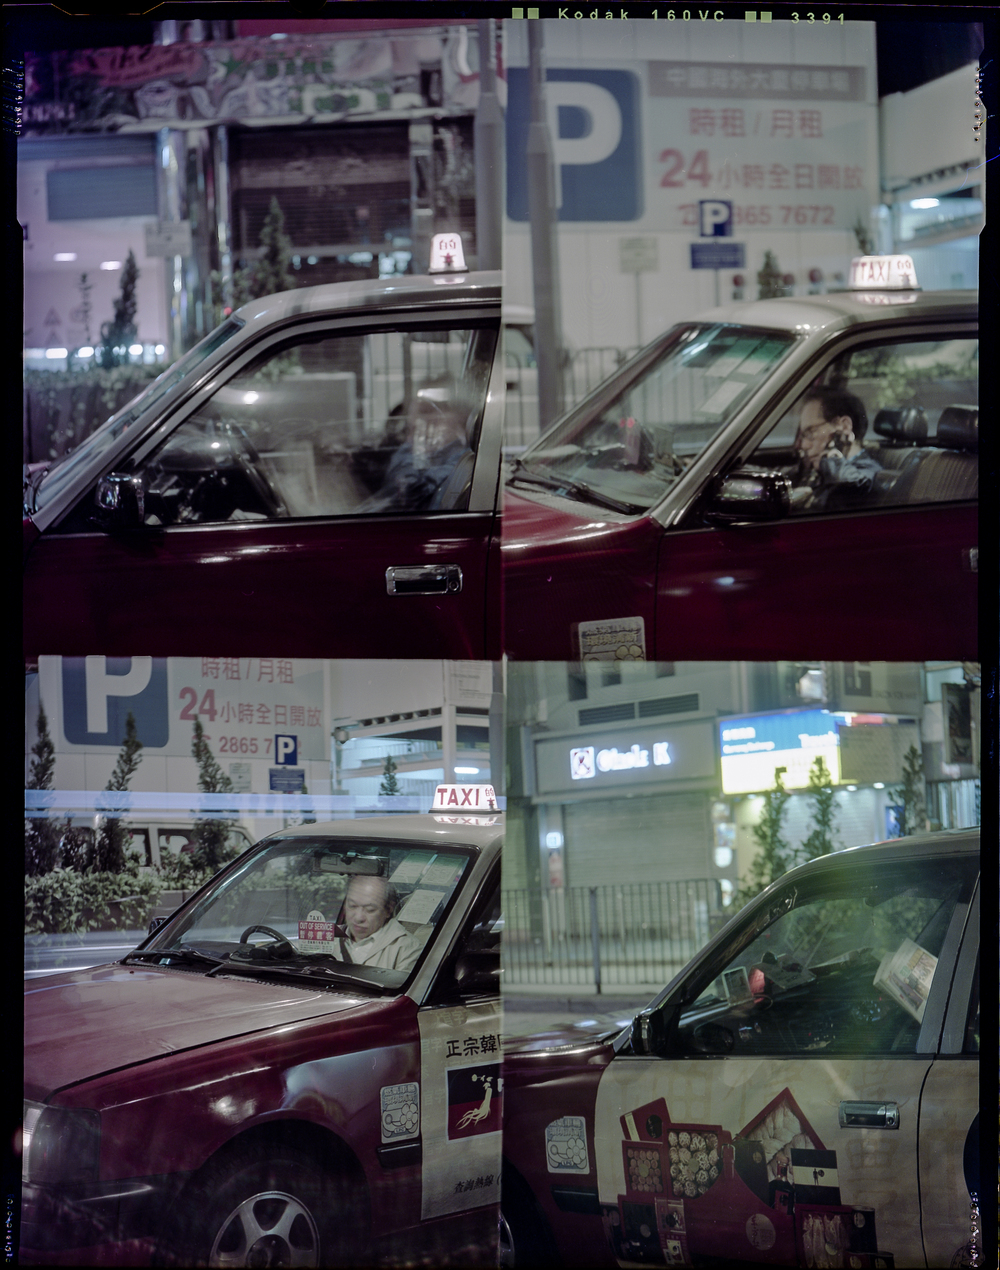 080413_Hong Kong_2011_3.jpg